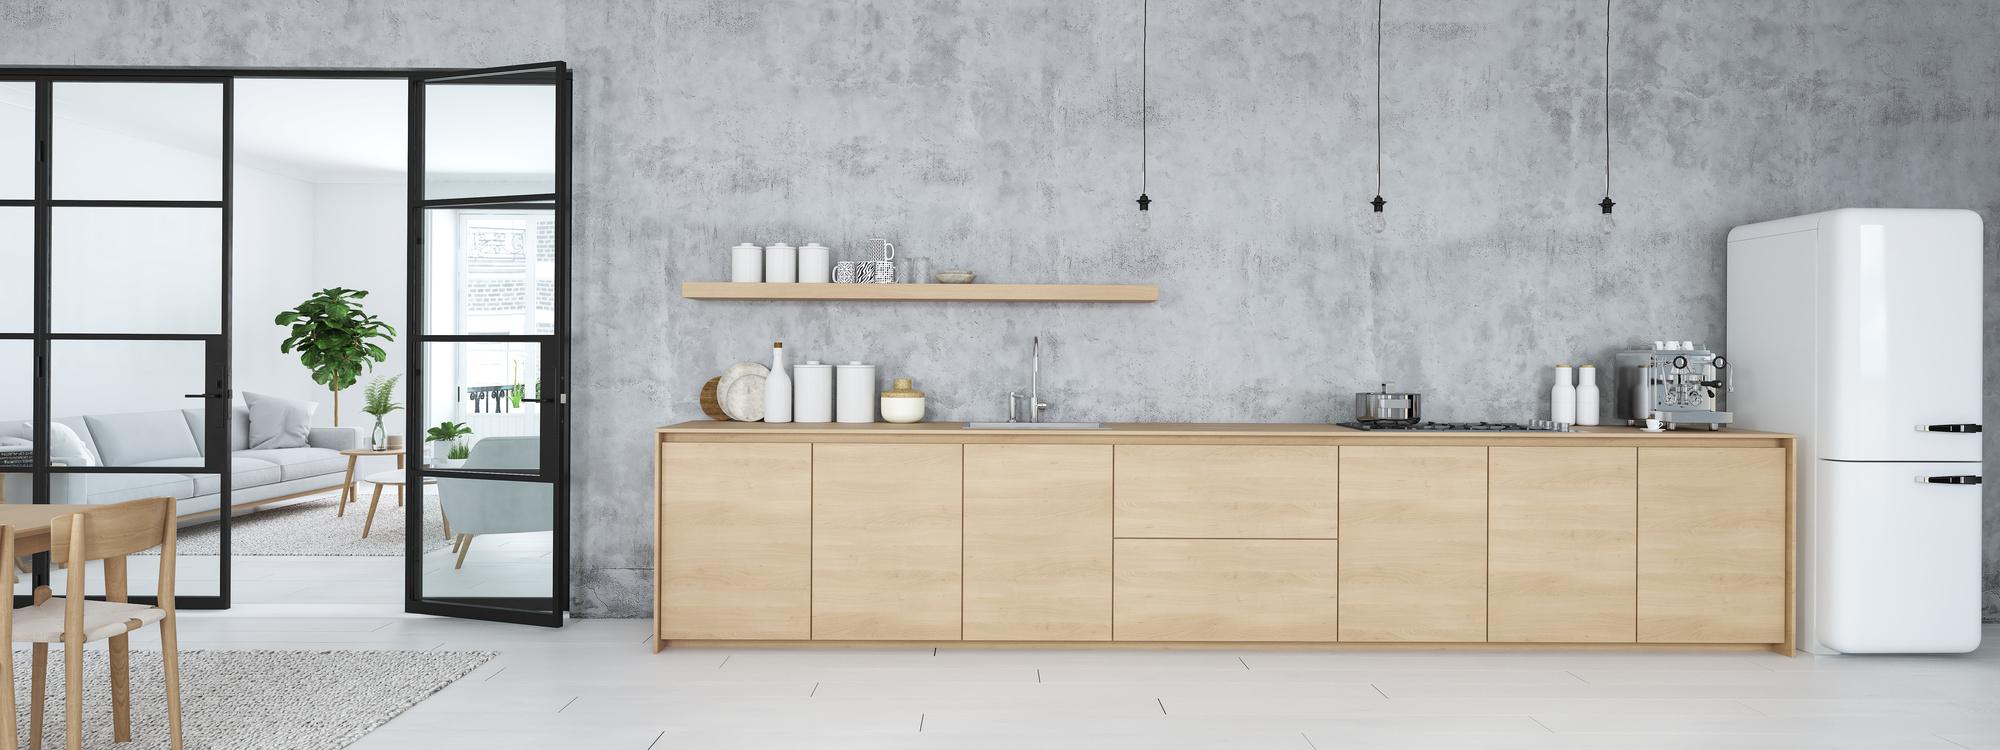 Four Ways to Use Concrete in Kitchens | Builder Magazine